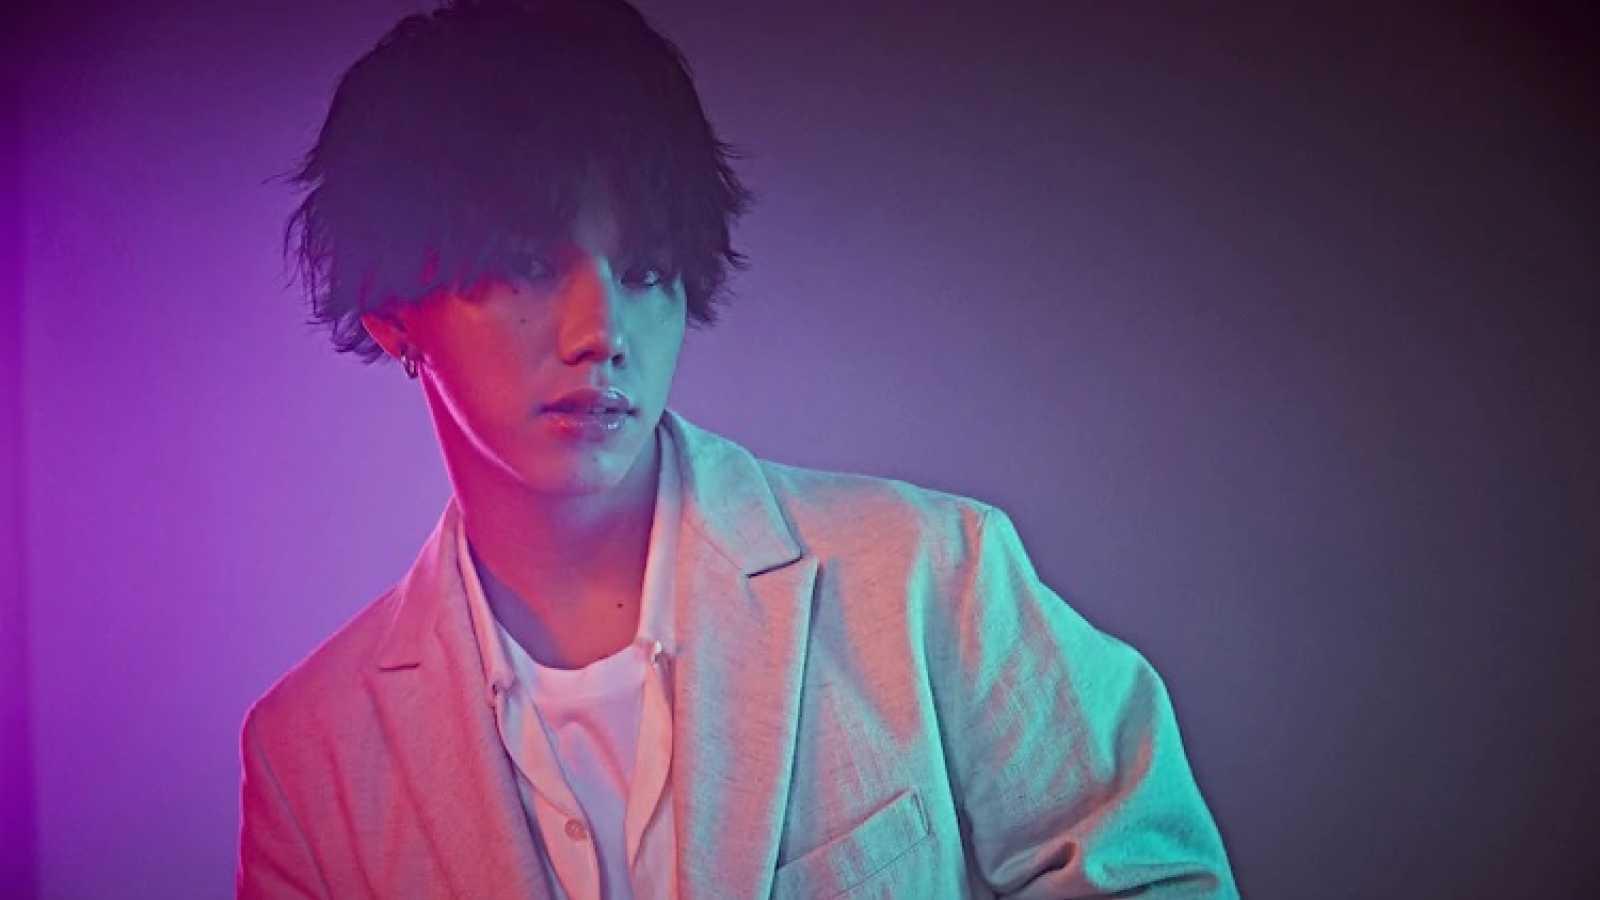 Anunciada a estreia solo de Hiro (MY FIRST STORY)